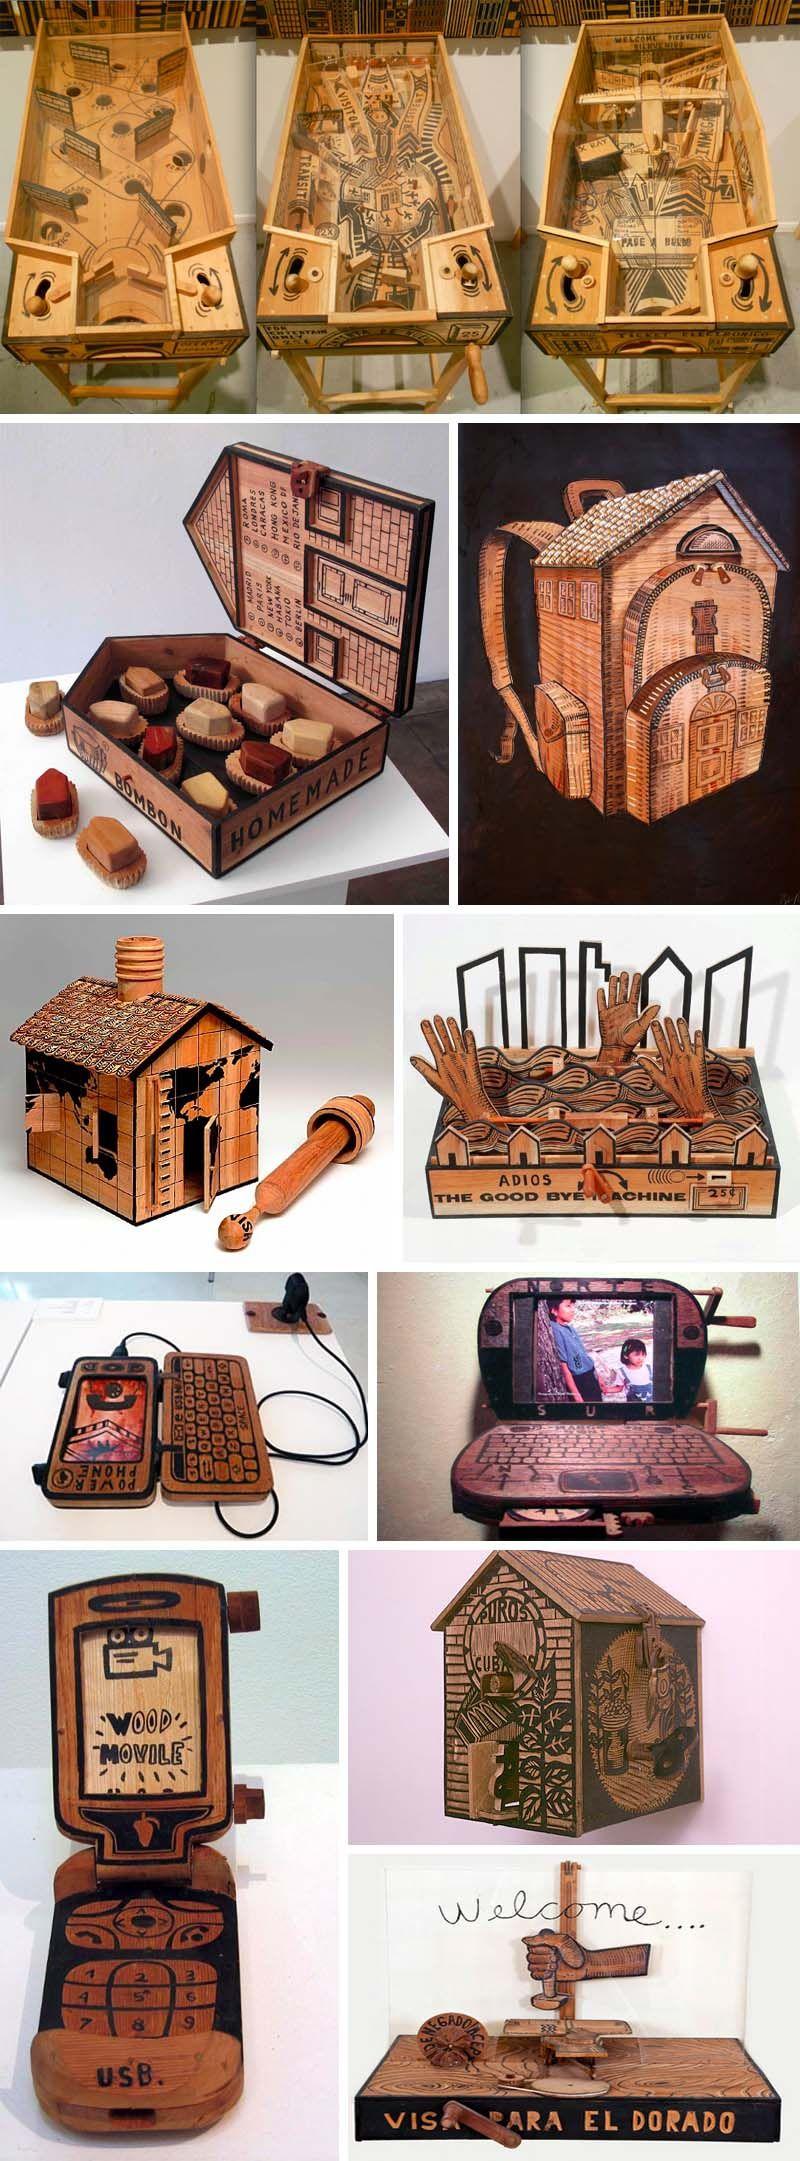 abel-barroso_contemporary-cuban-art_wood-sculpture_collabcubed.jpg 800×2161 pikseli